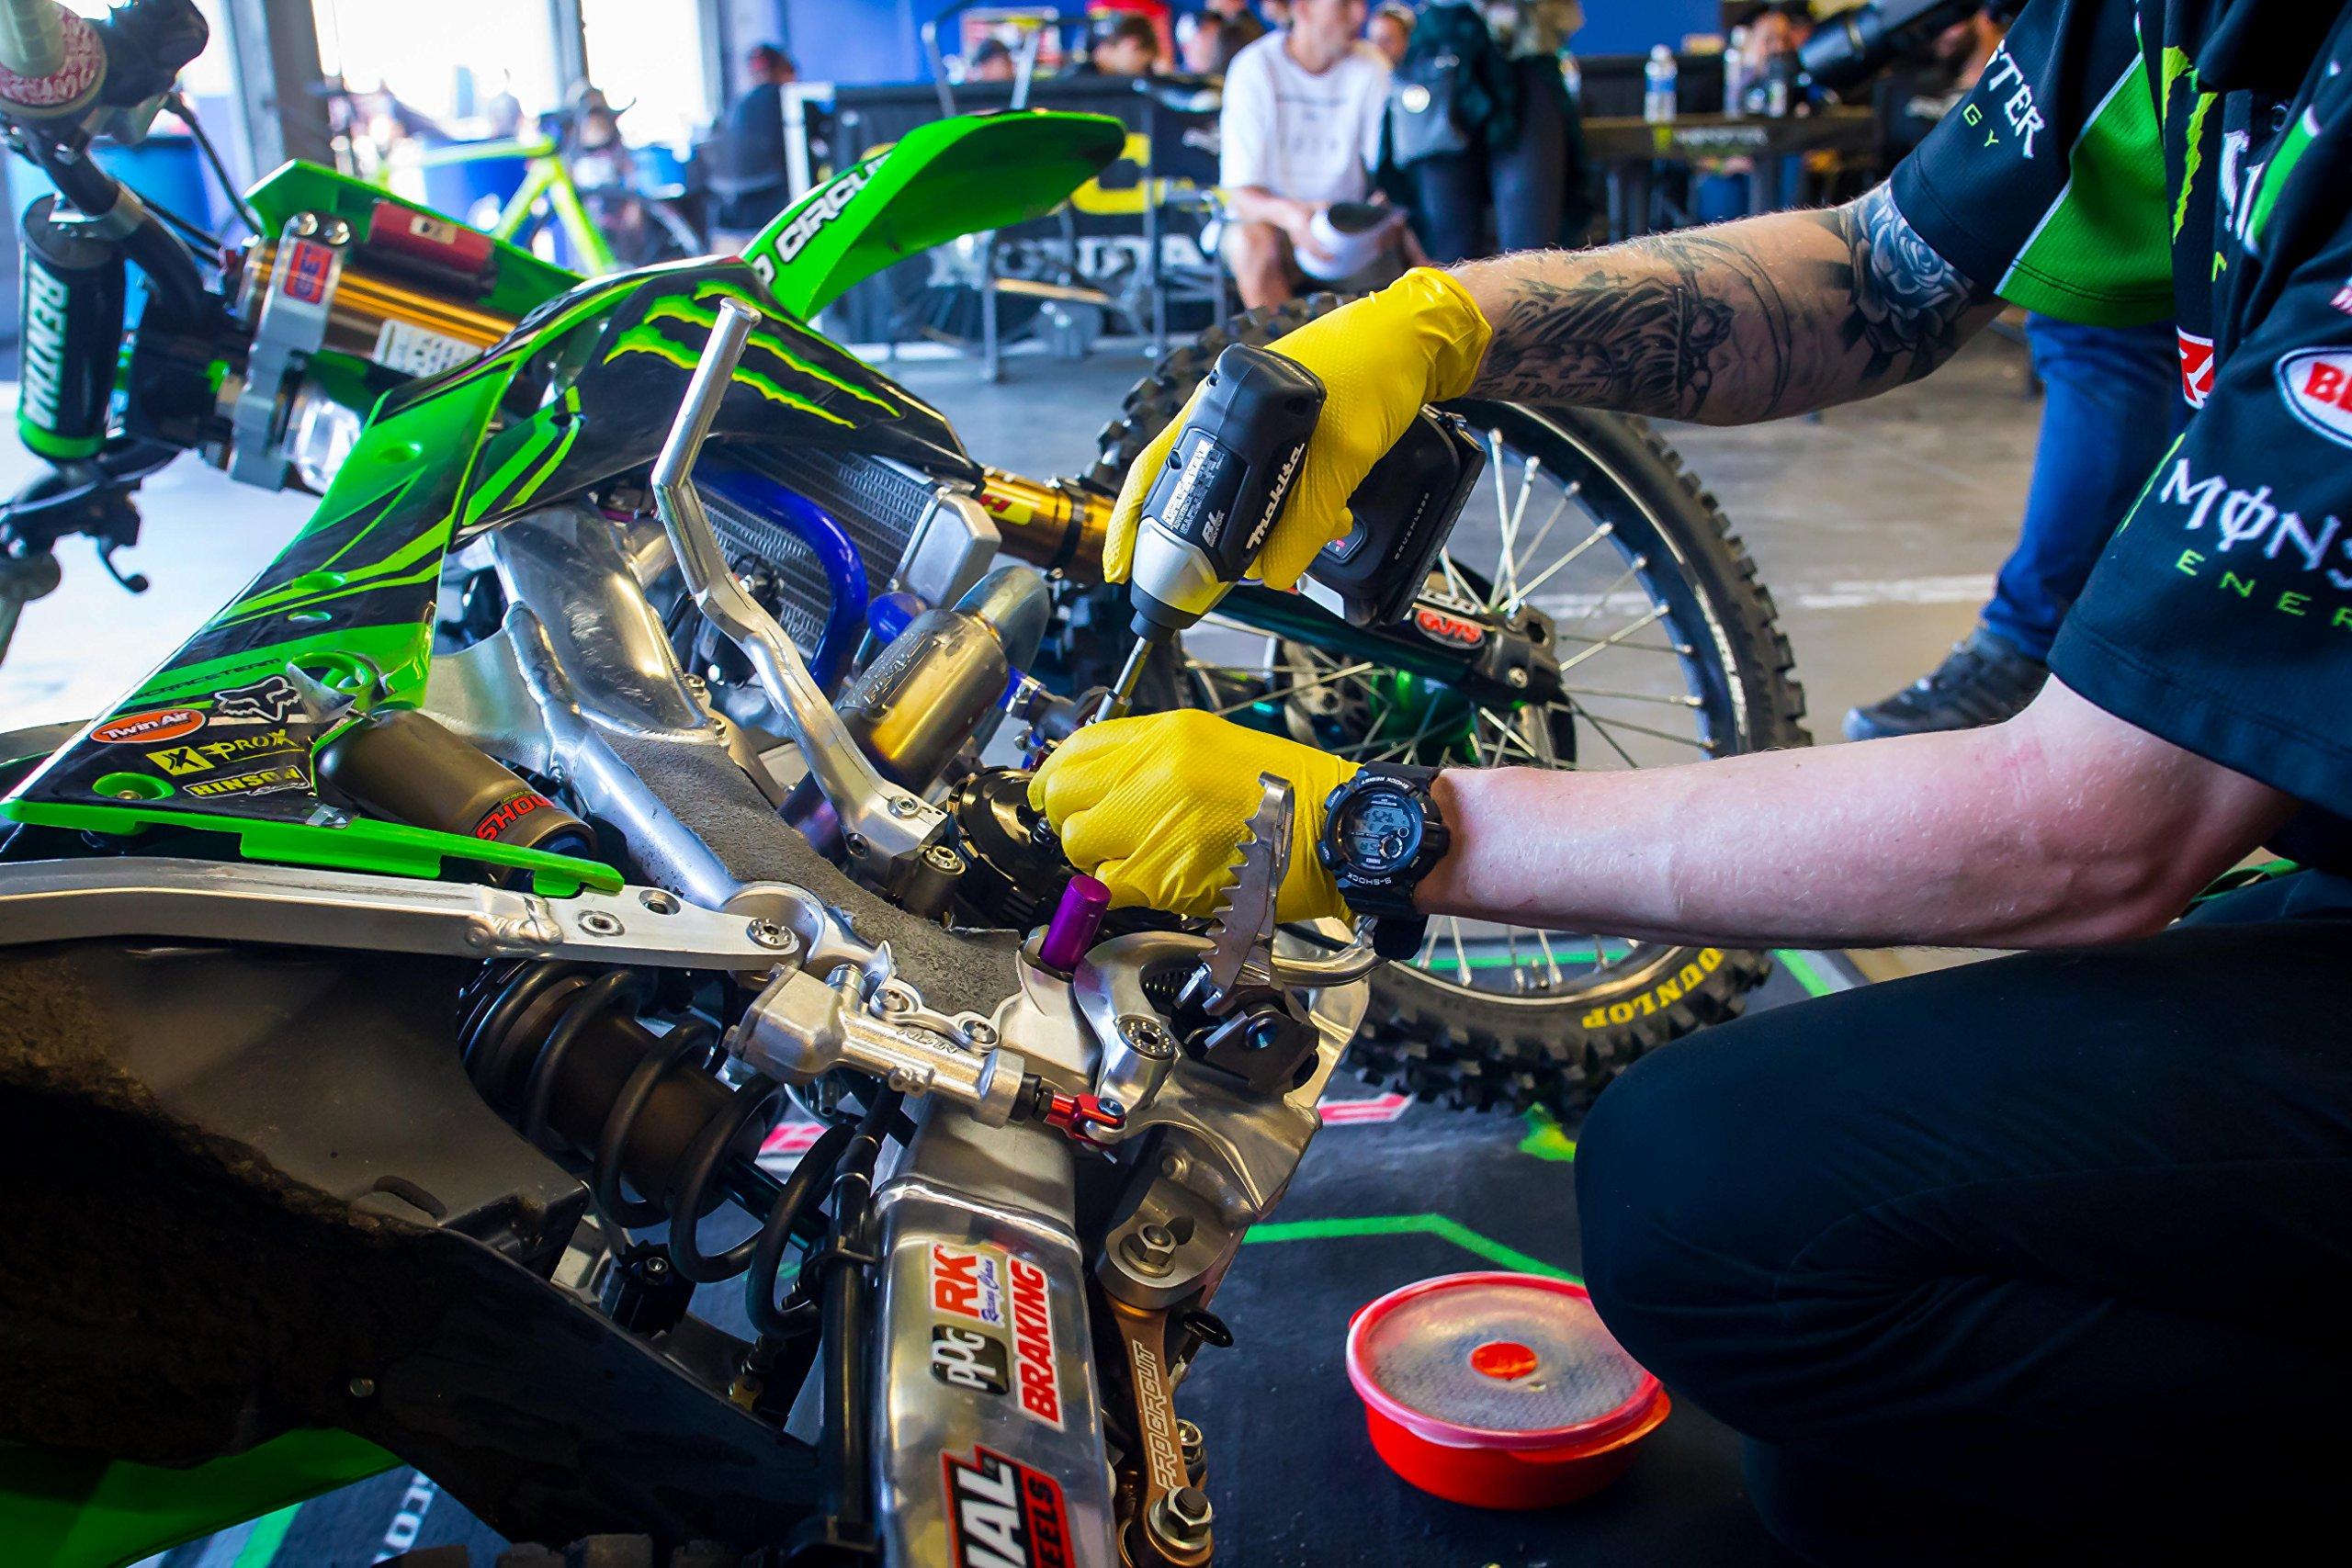 Mechanix Wear - Nitrile Disposable Gloves - Powder Free, Latex Free, Diamond Textured - 8 mil Yellow (Large, 100 Pack) by Mechanix Wear (Image #4)